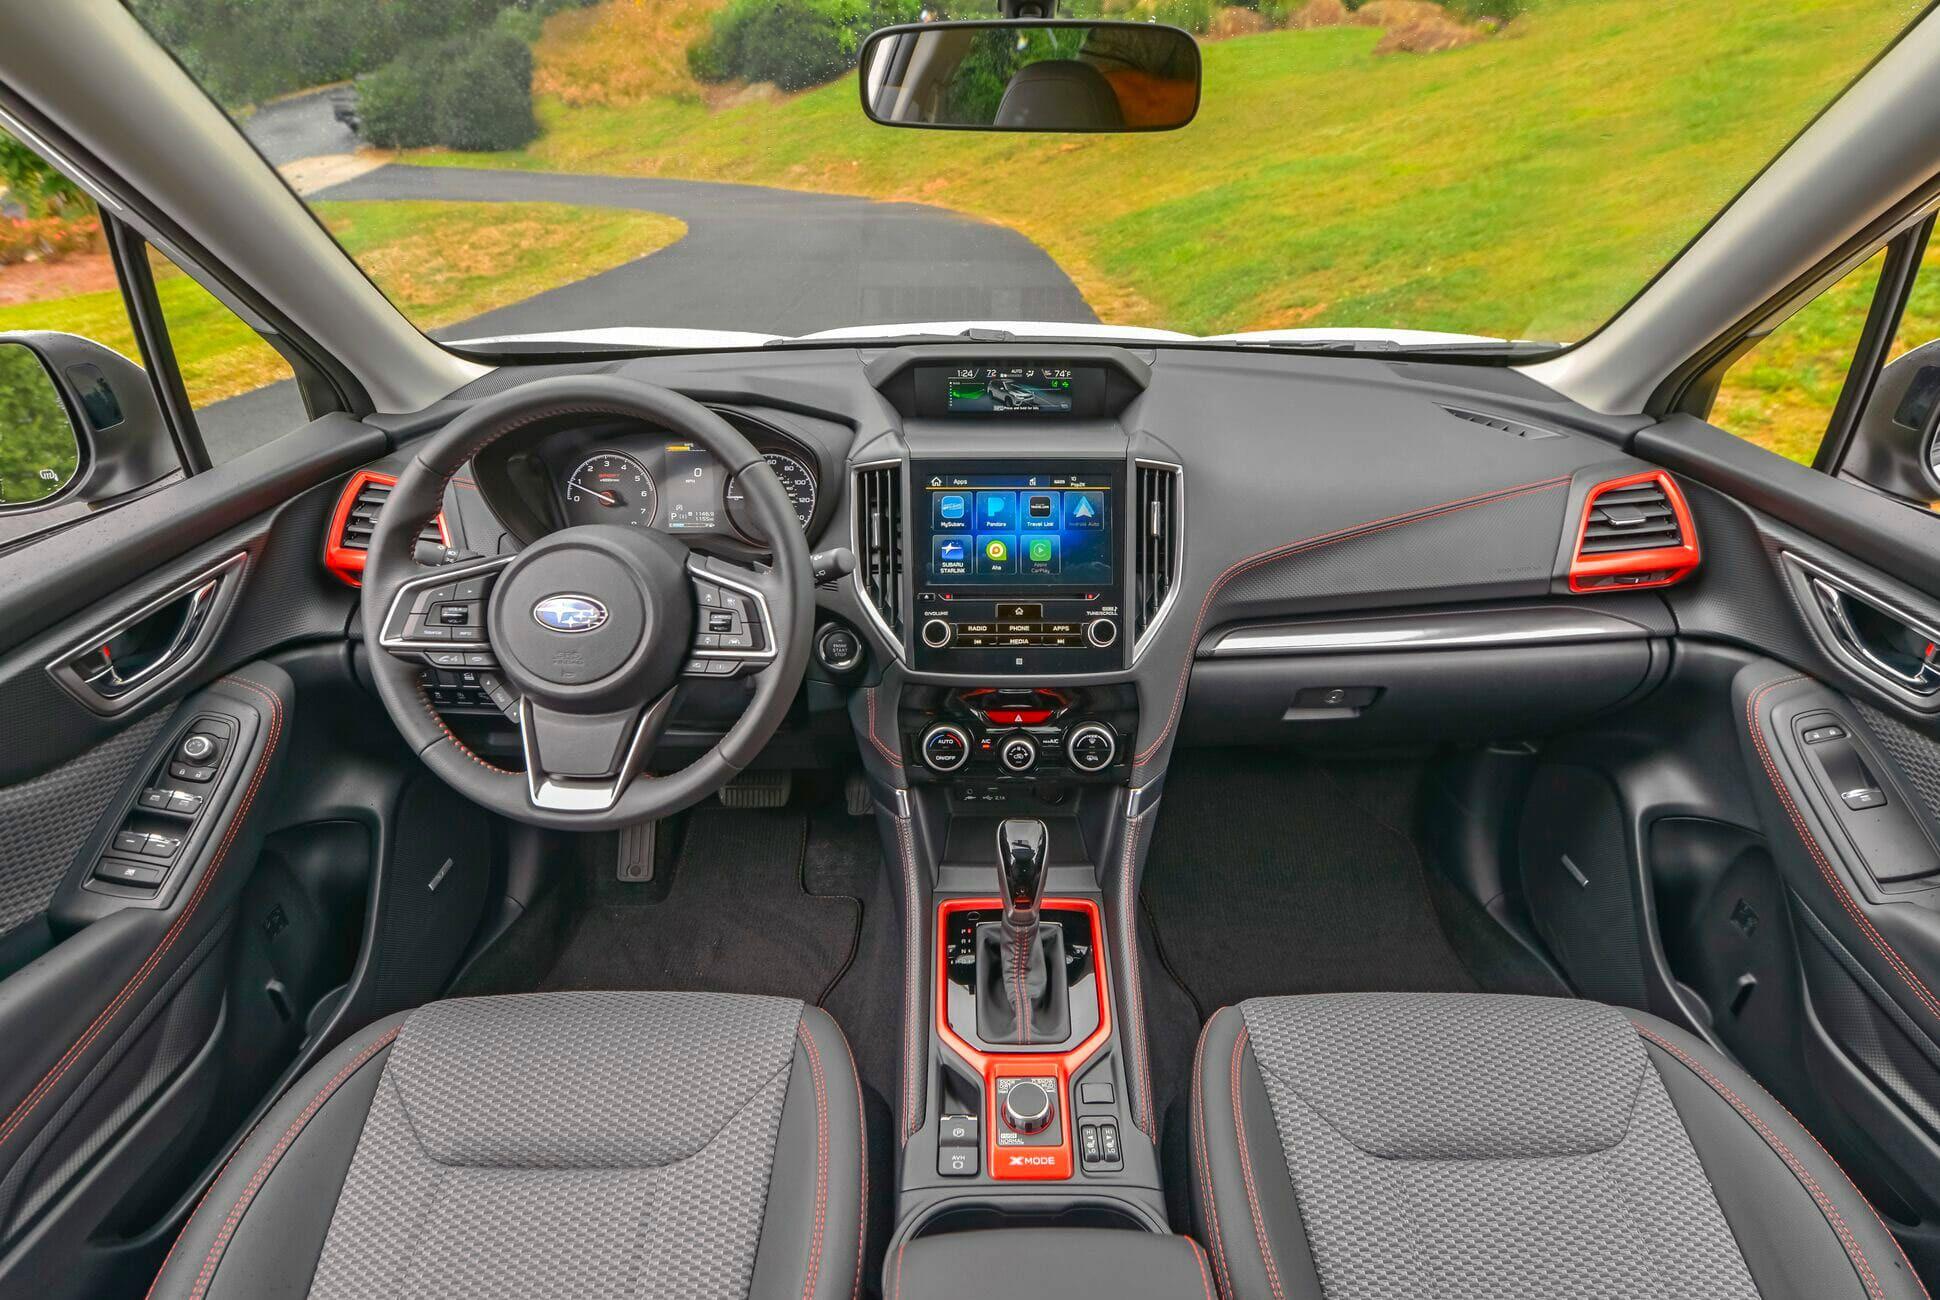 2019-Subaru-Forester-Gear-Patrol-Slide-4